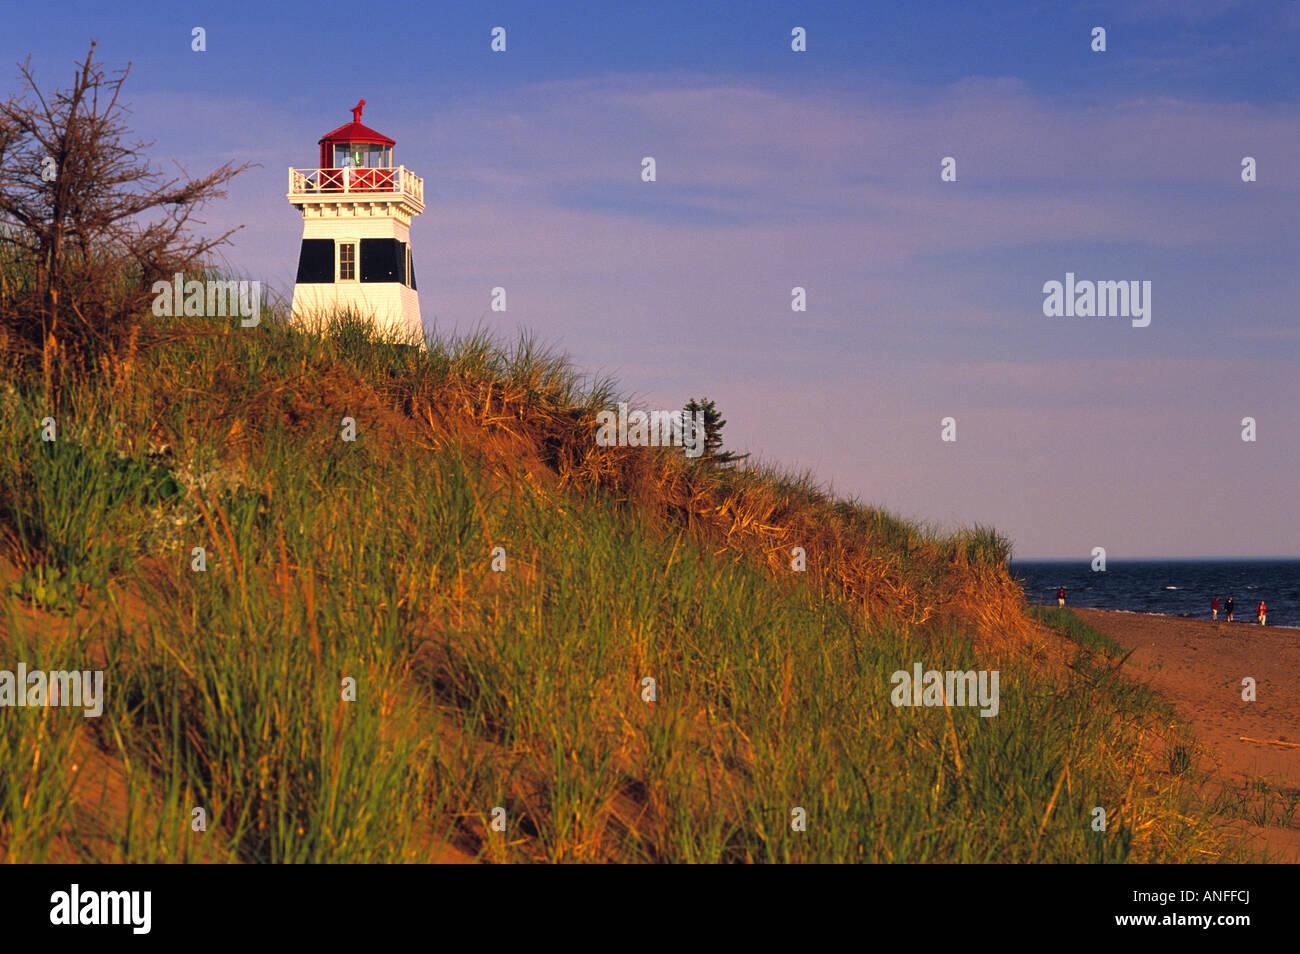 West Point Lighthouse, West Point, Prince Edward Island, Canada - Stock Image